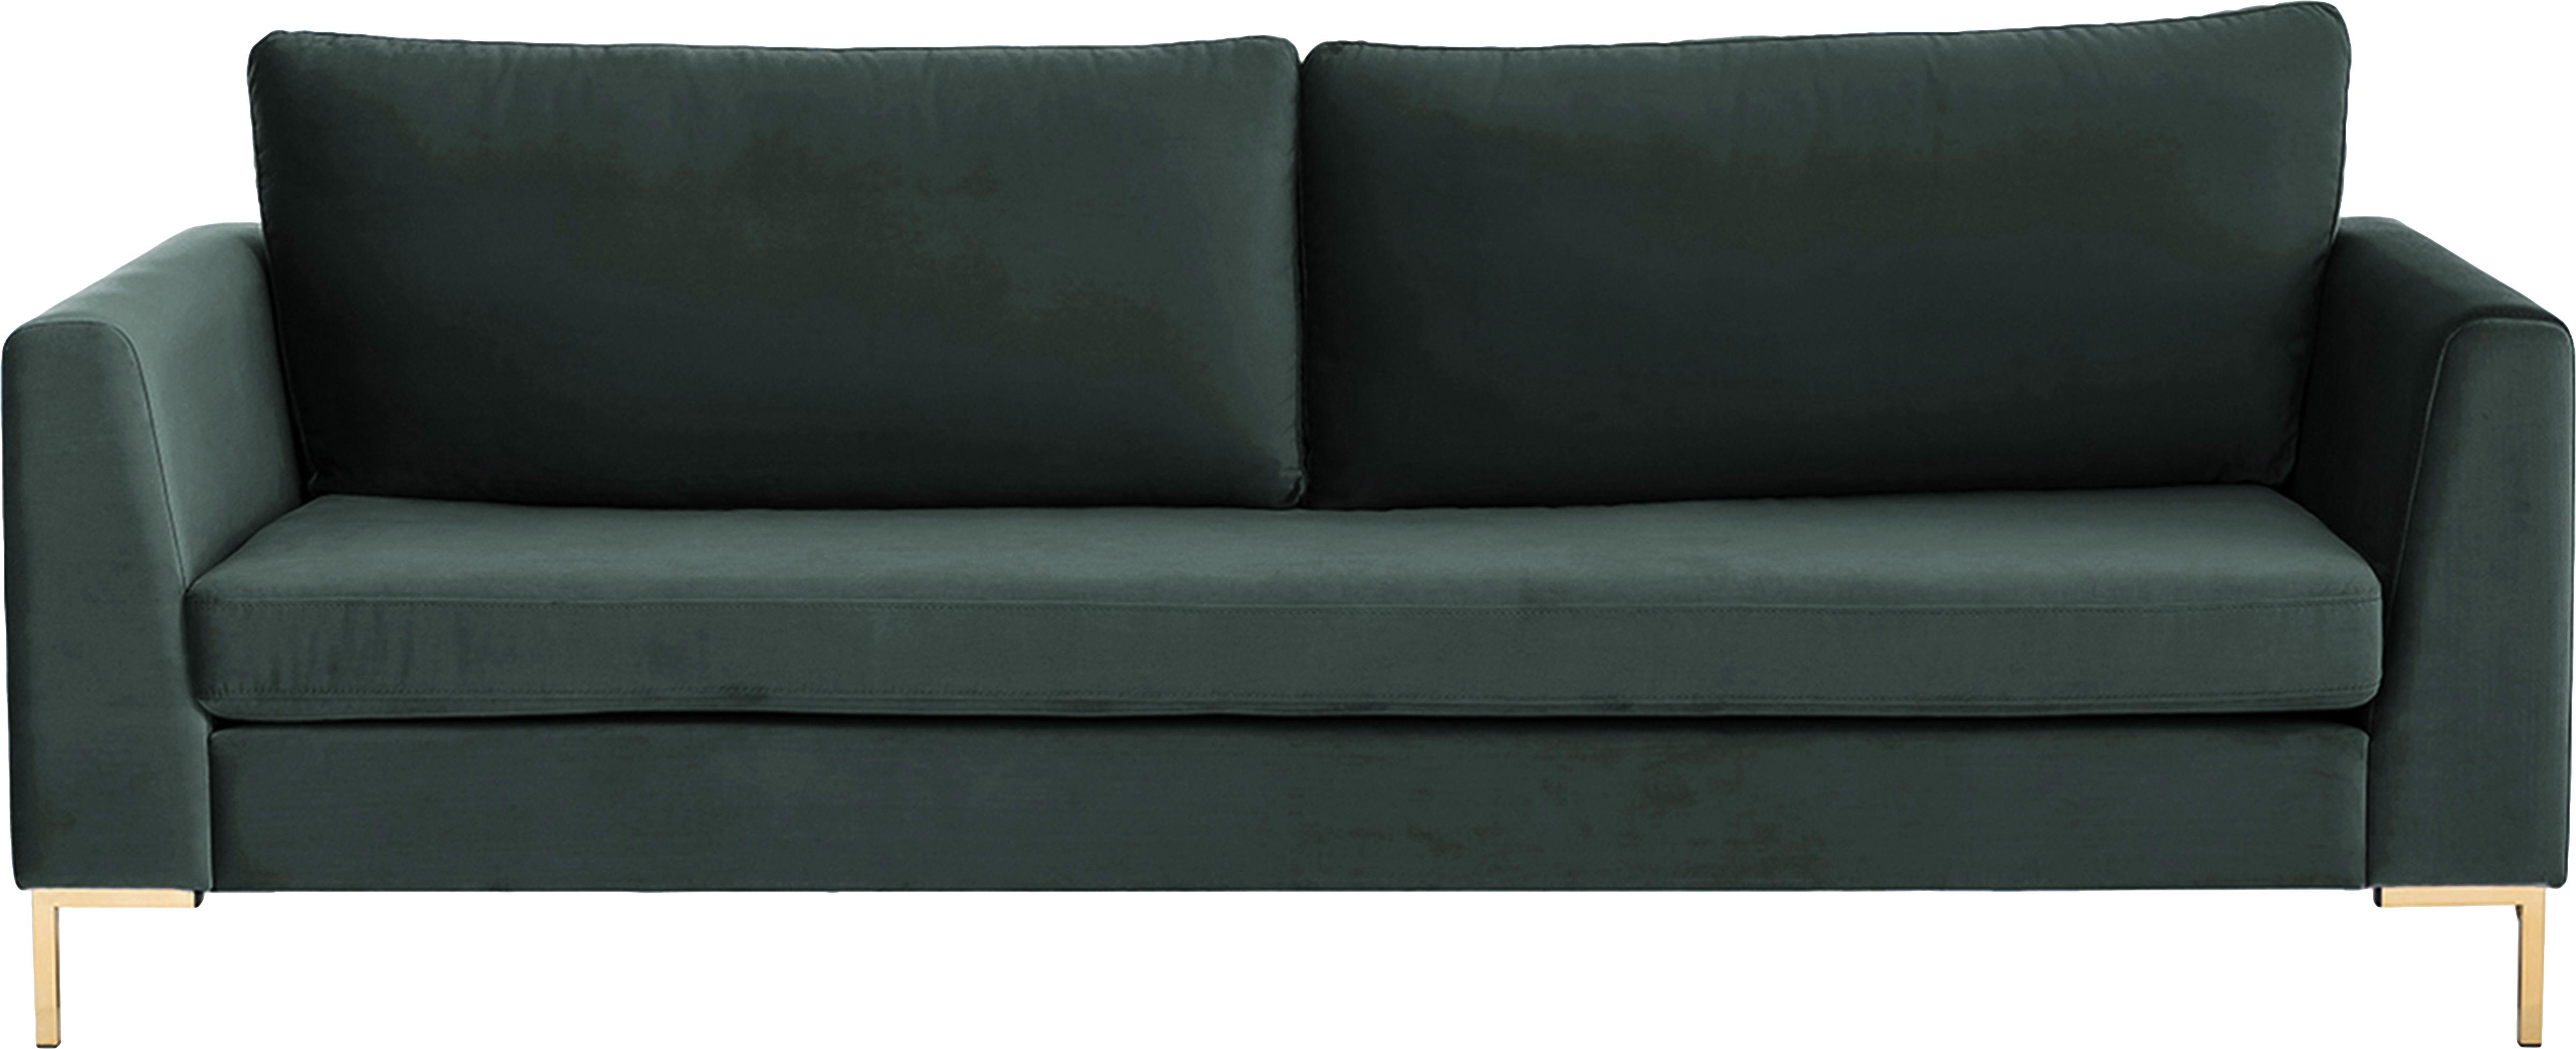 Samt-Sofa Luna (3-Sitzer), Bezug: Samt (Polyester) 80.000 S, Gestell: Massives Buchenholz, Samt Dunkelgrün, Gold, B 230 x T 95 cm